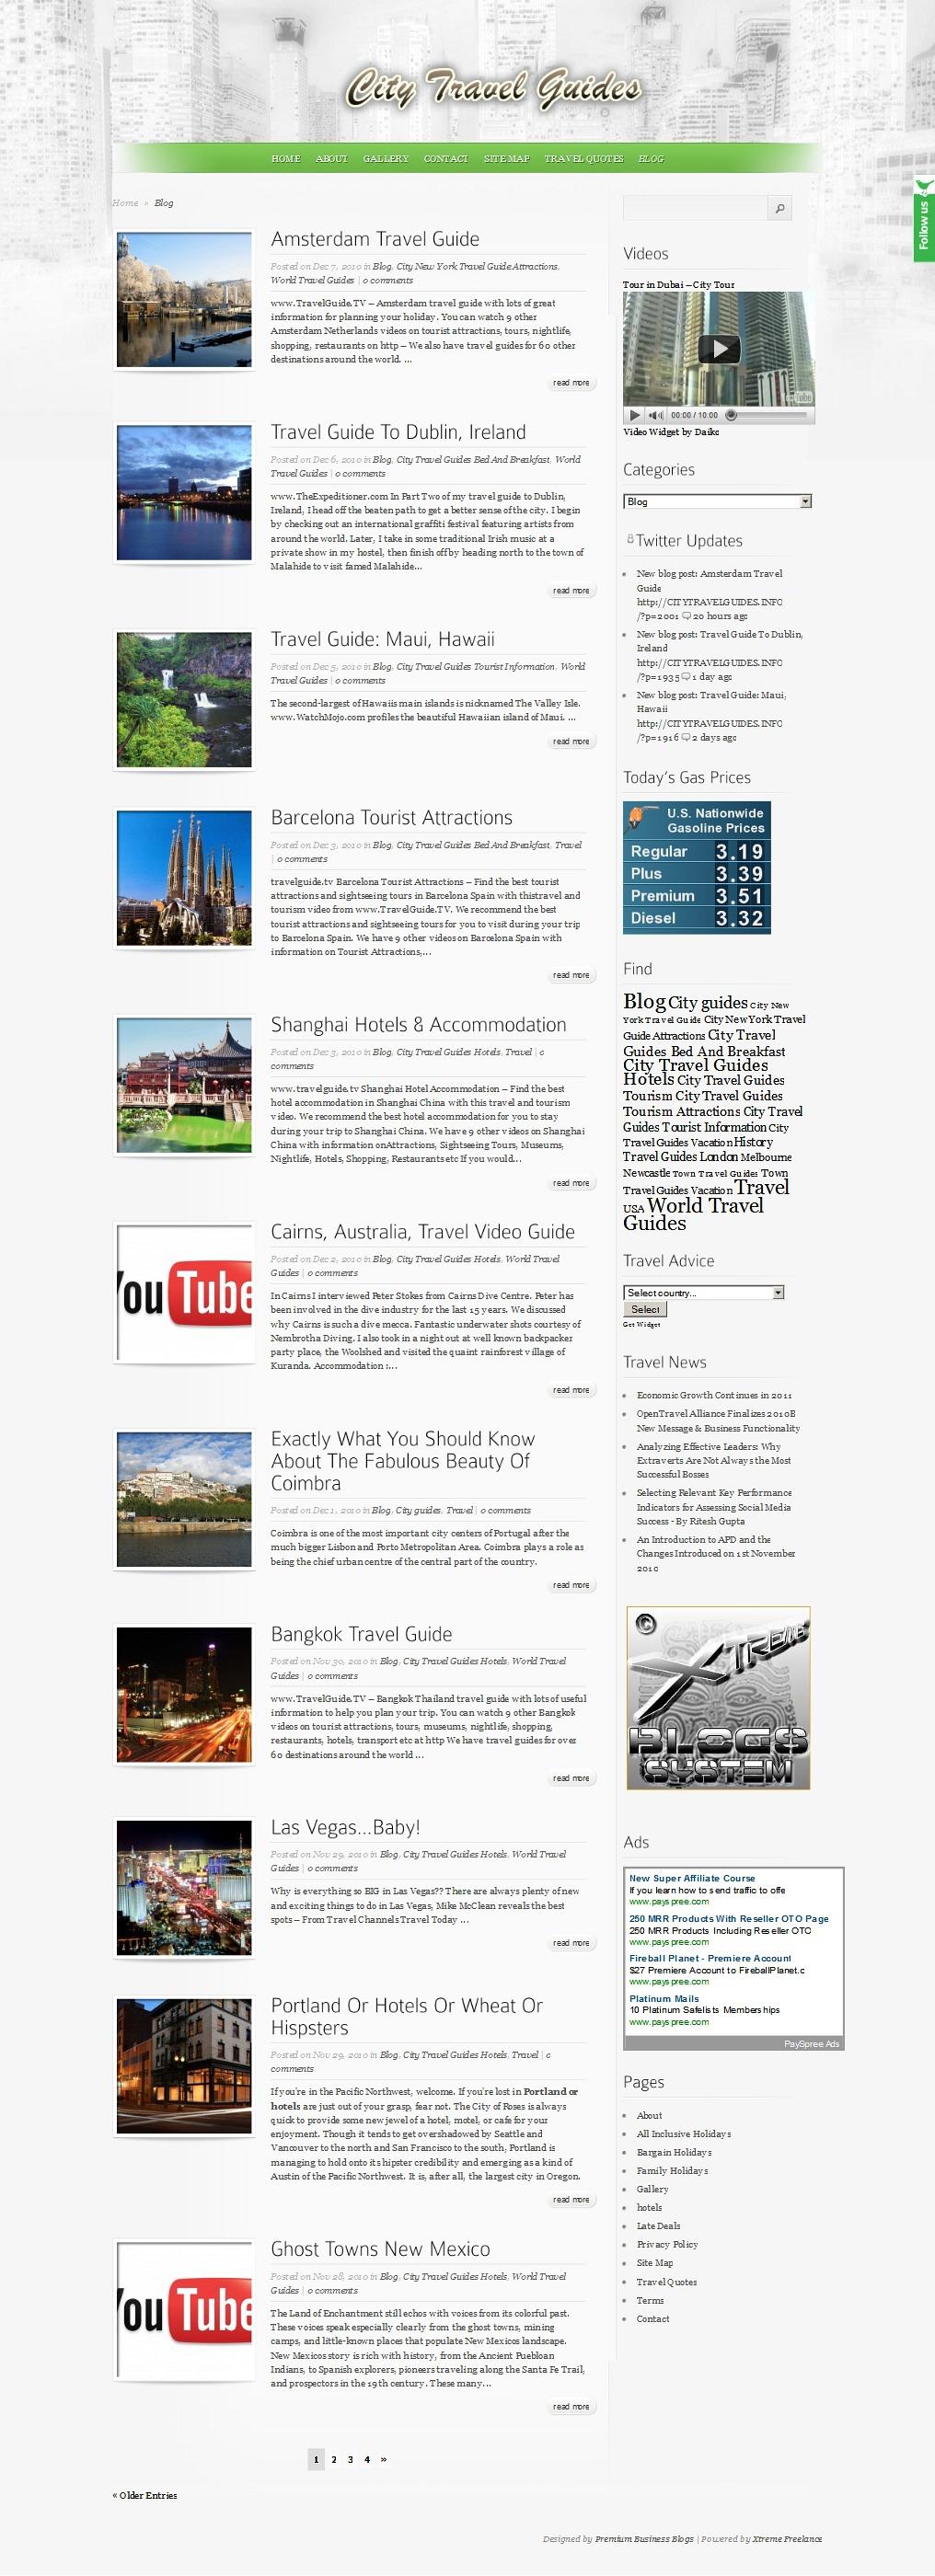 citytravelguides_blog